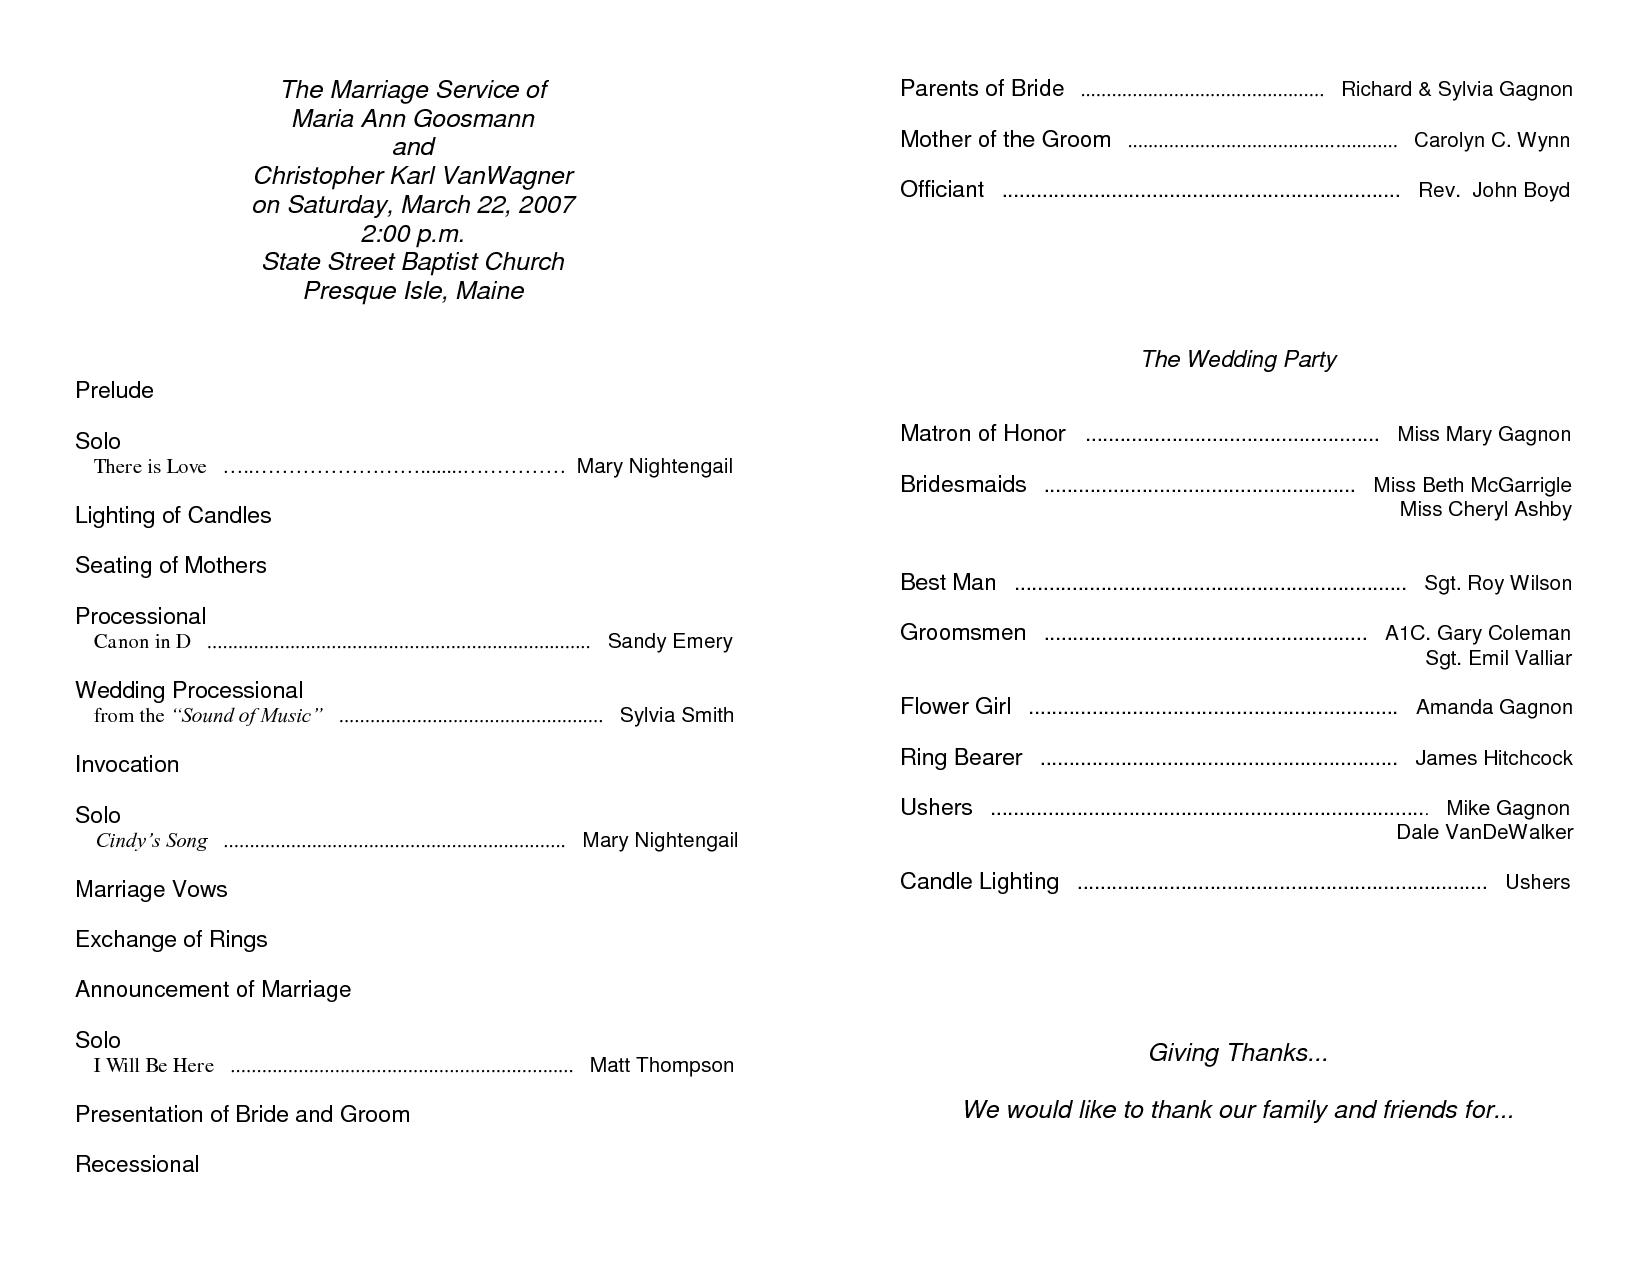 Christmas Charades Free Party Game Printable. Download - Free Printable Christmas Plays Church